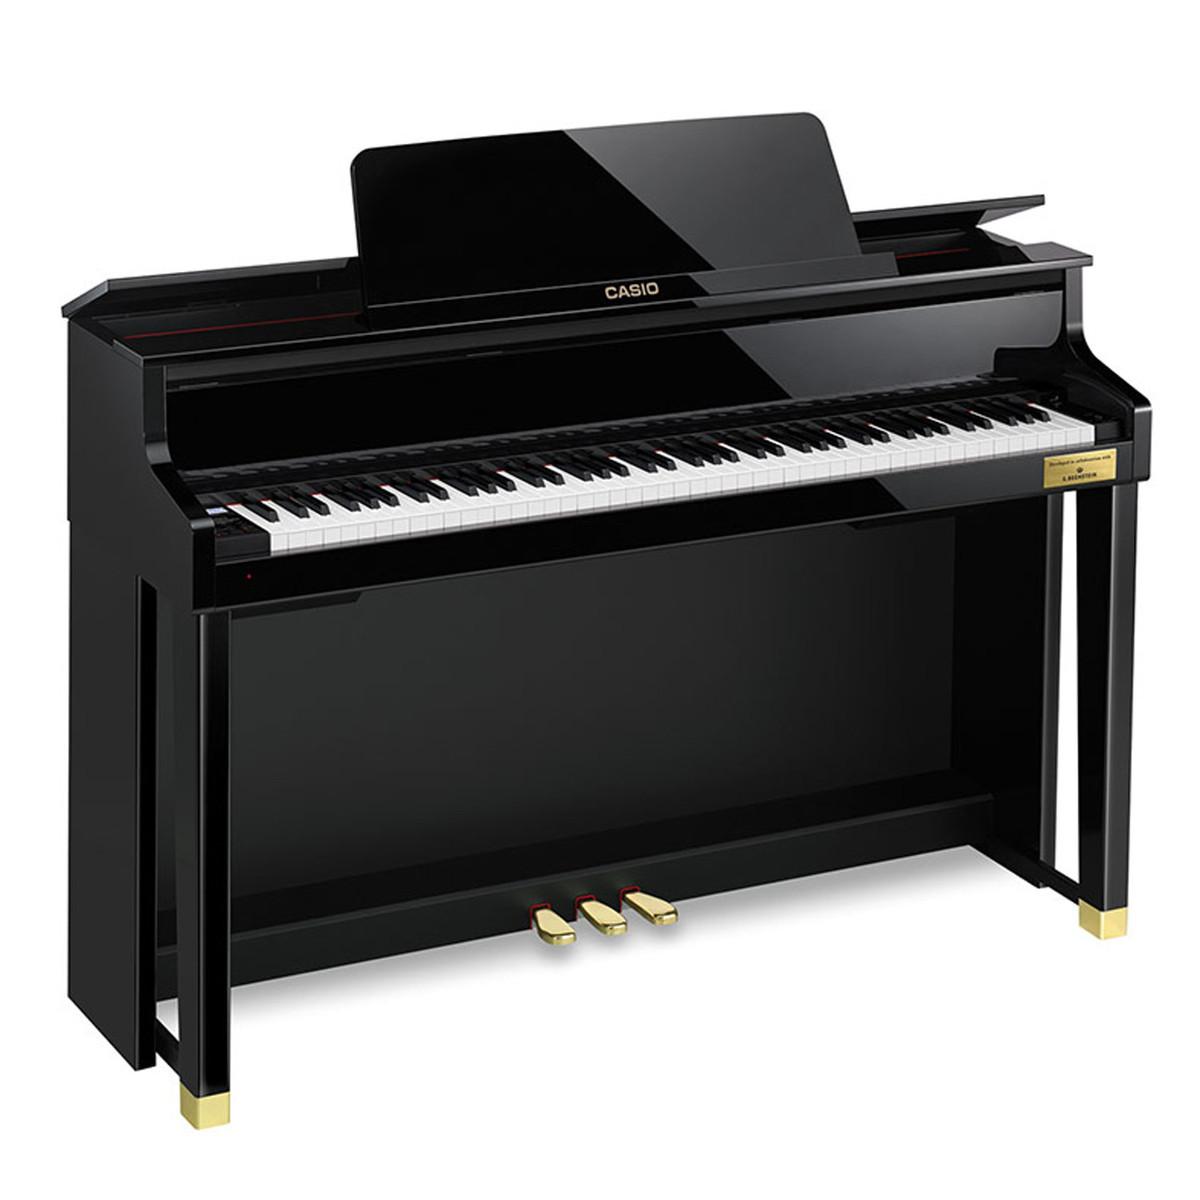 casio celviano gp500 grand hybrid digital piano polished ebony at. Black Bedroom Furniture Sets. Home Design Ideas